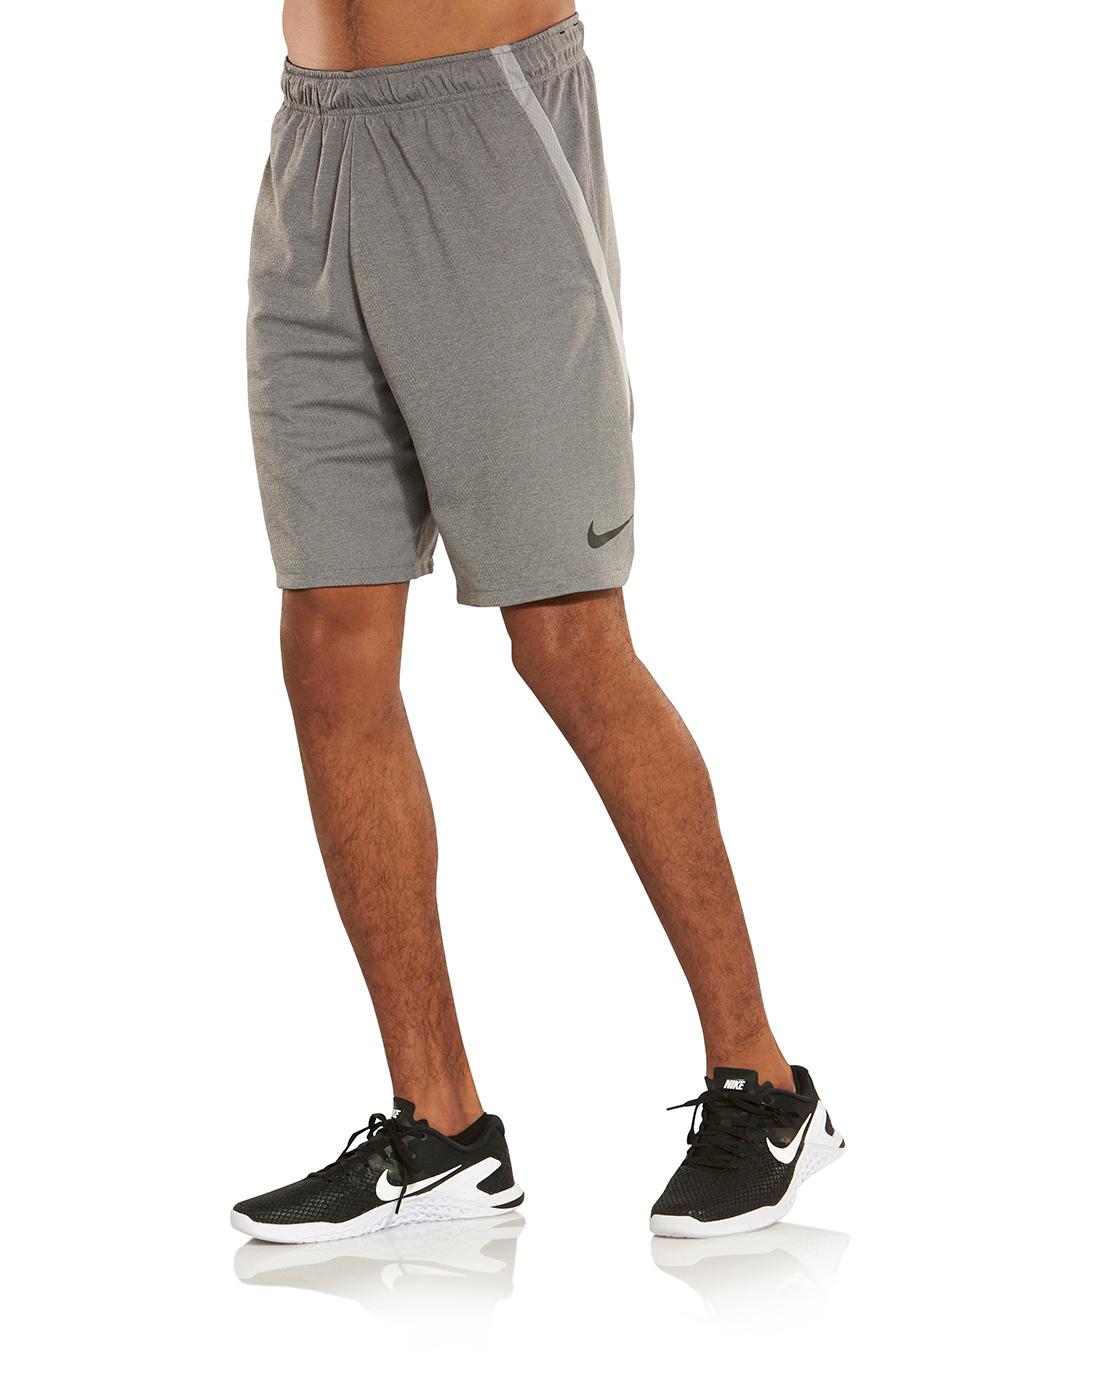 ecf10109f535 Men s Nike Dry Shorts 4.0